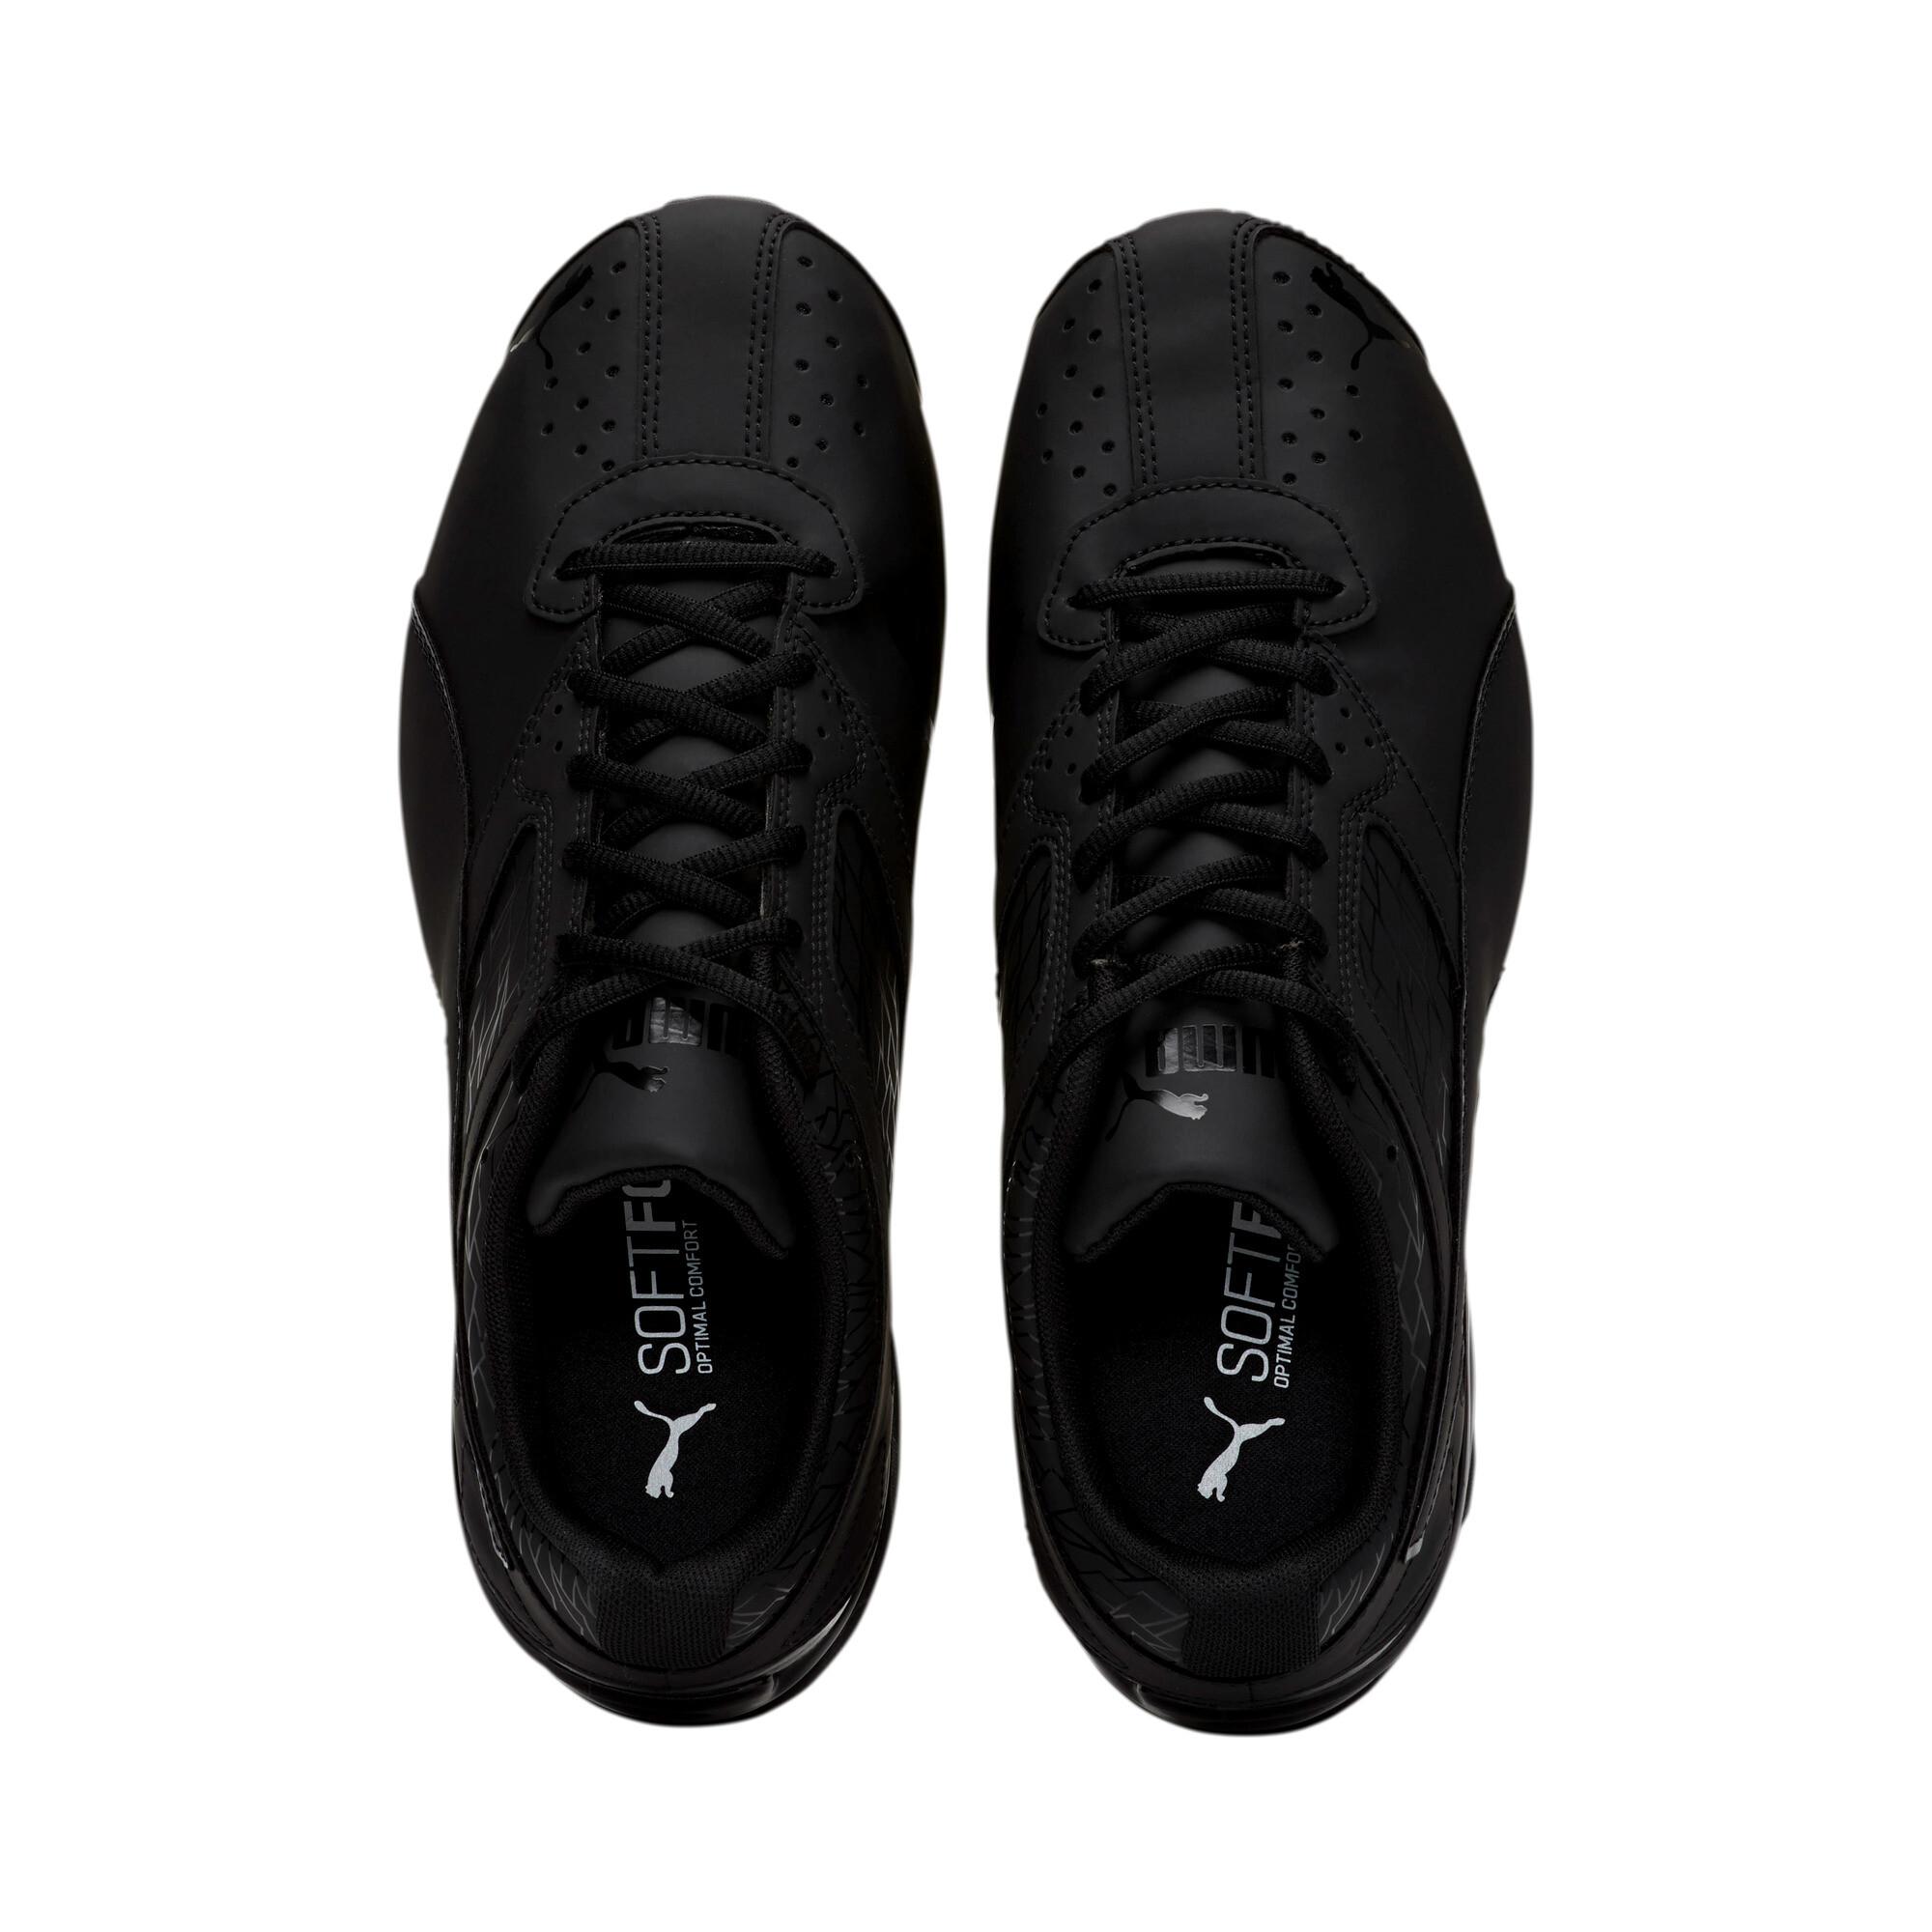 PUMA-Men-039-s-Tazon-6-Fracture-FM-Wide-Sneakers miniatura 12